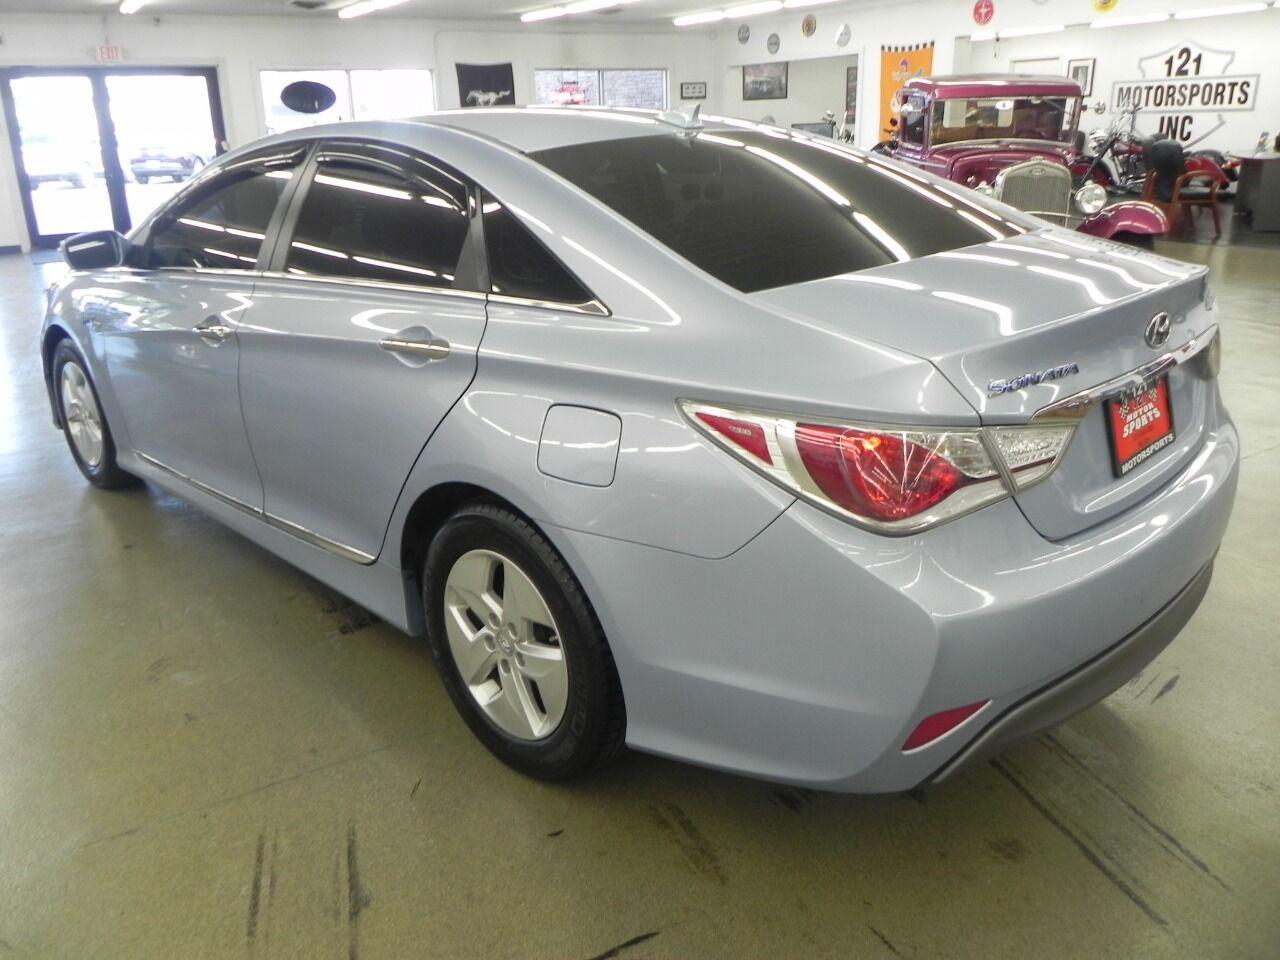 2012 hyundai sonata hybrid in mt zion, il used cars for sale on easyautosales.com